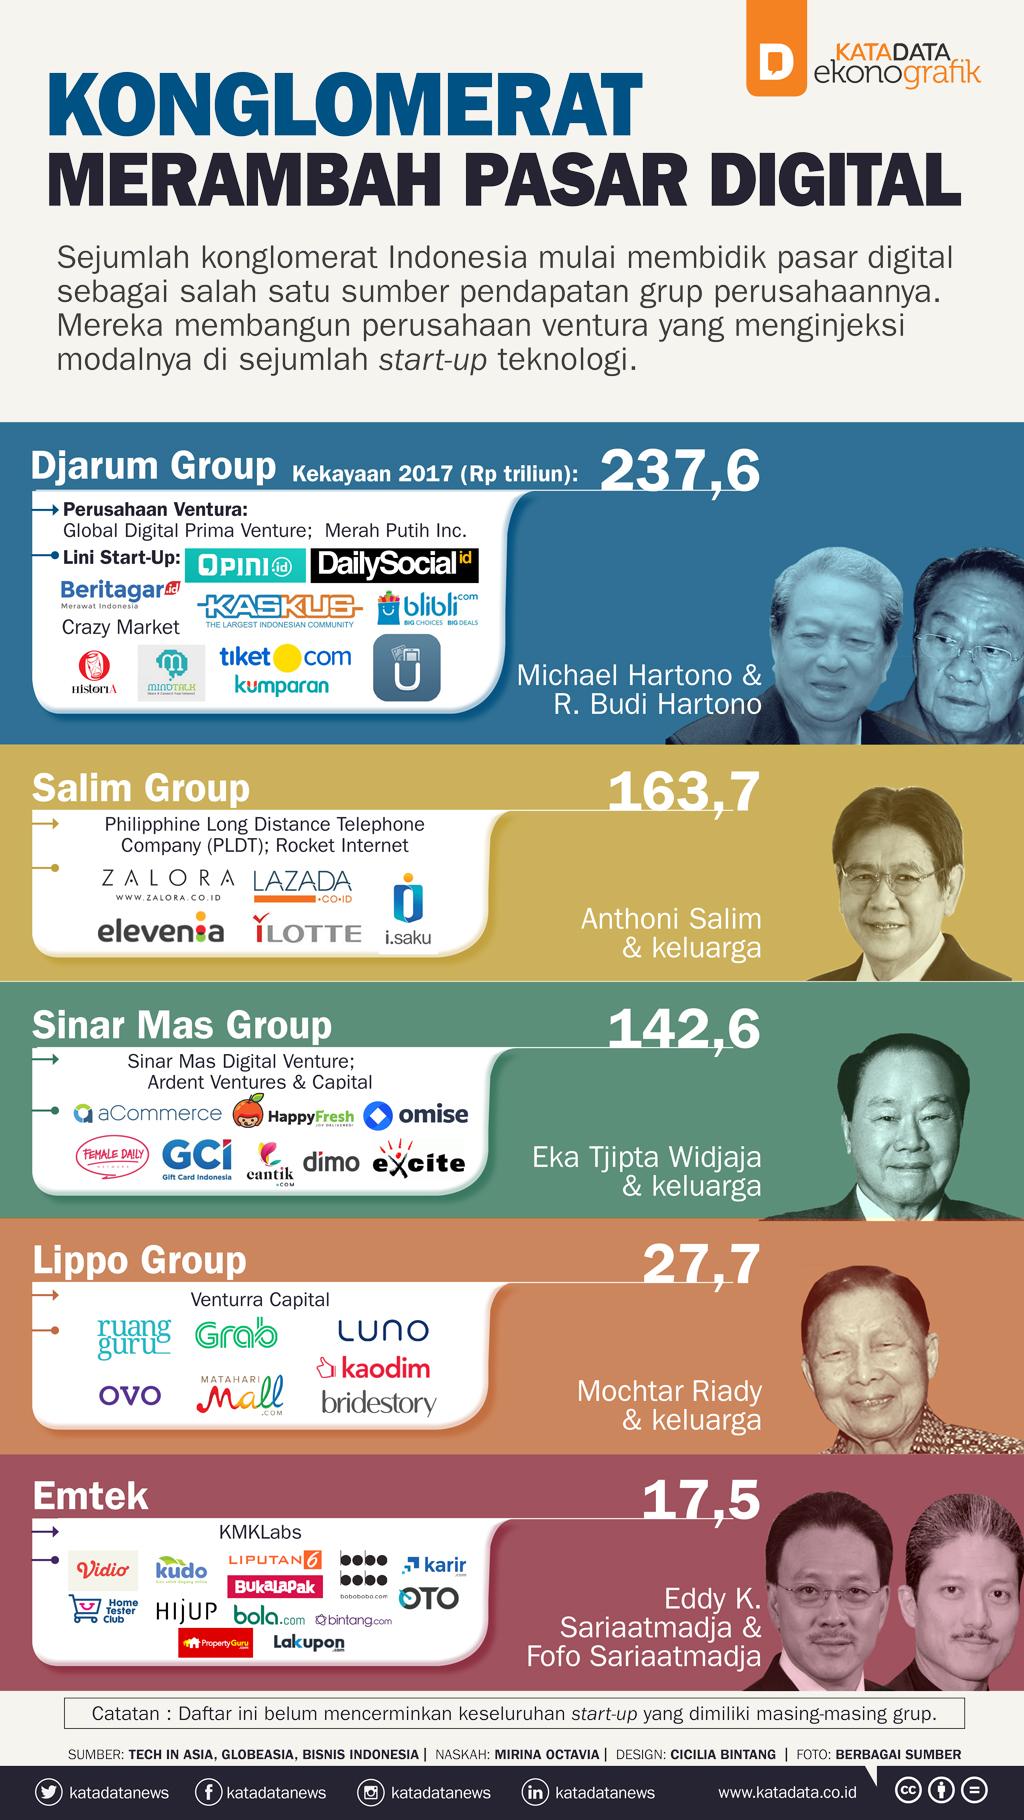 Konglomerat Merambah Digital